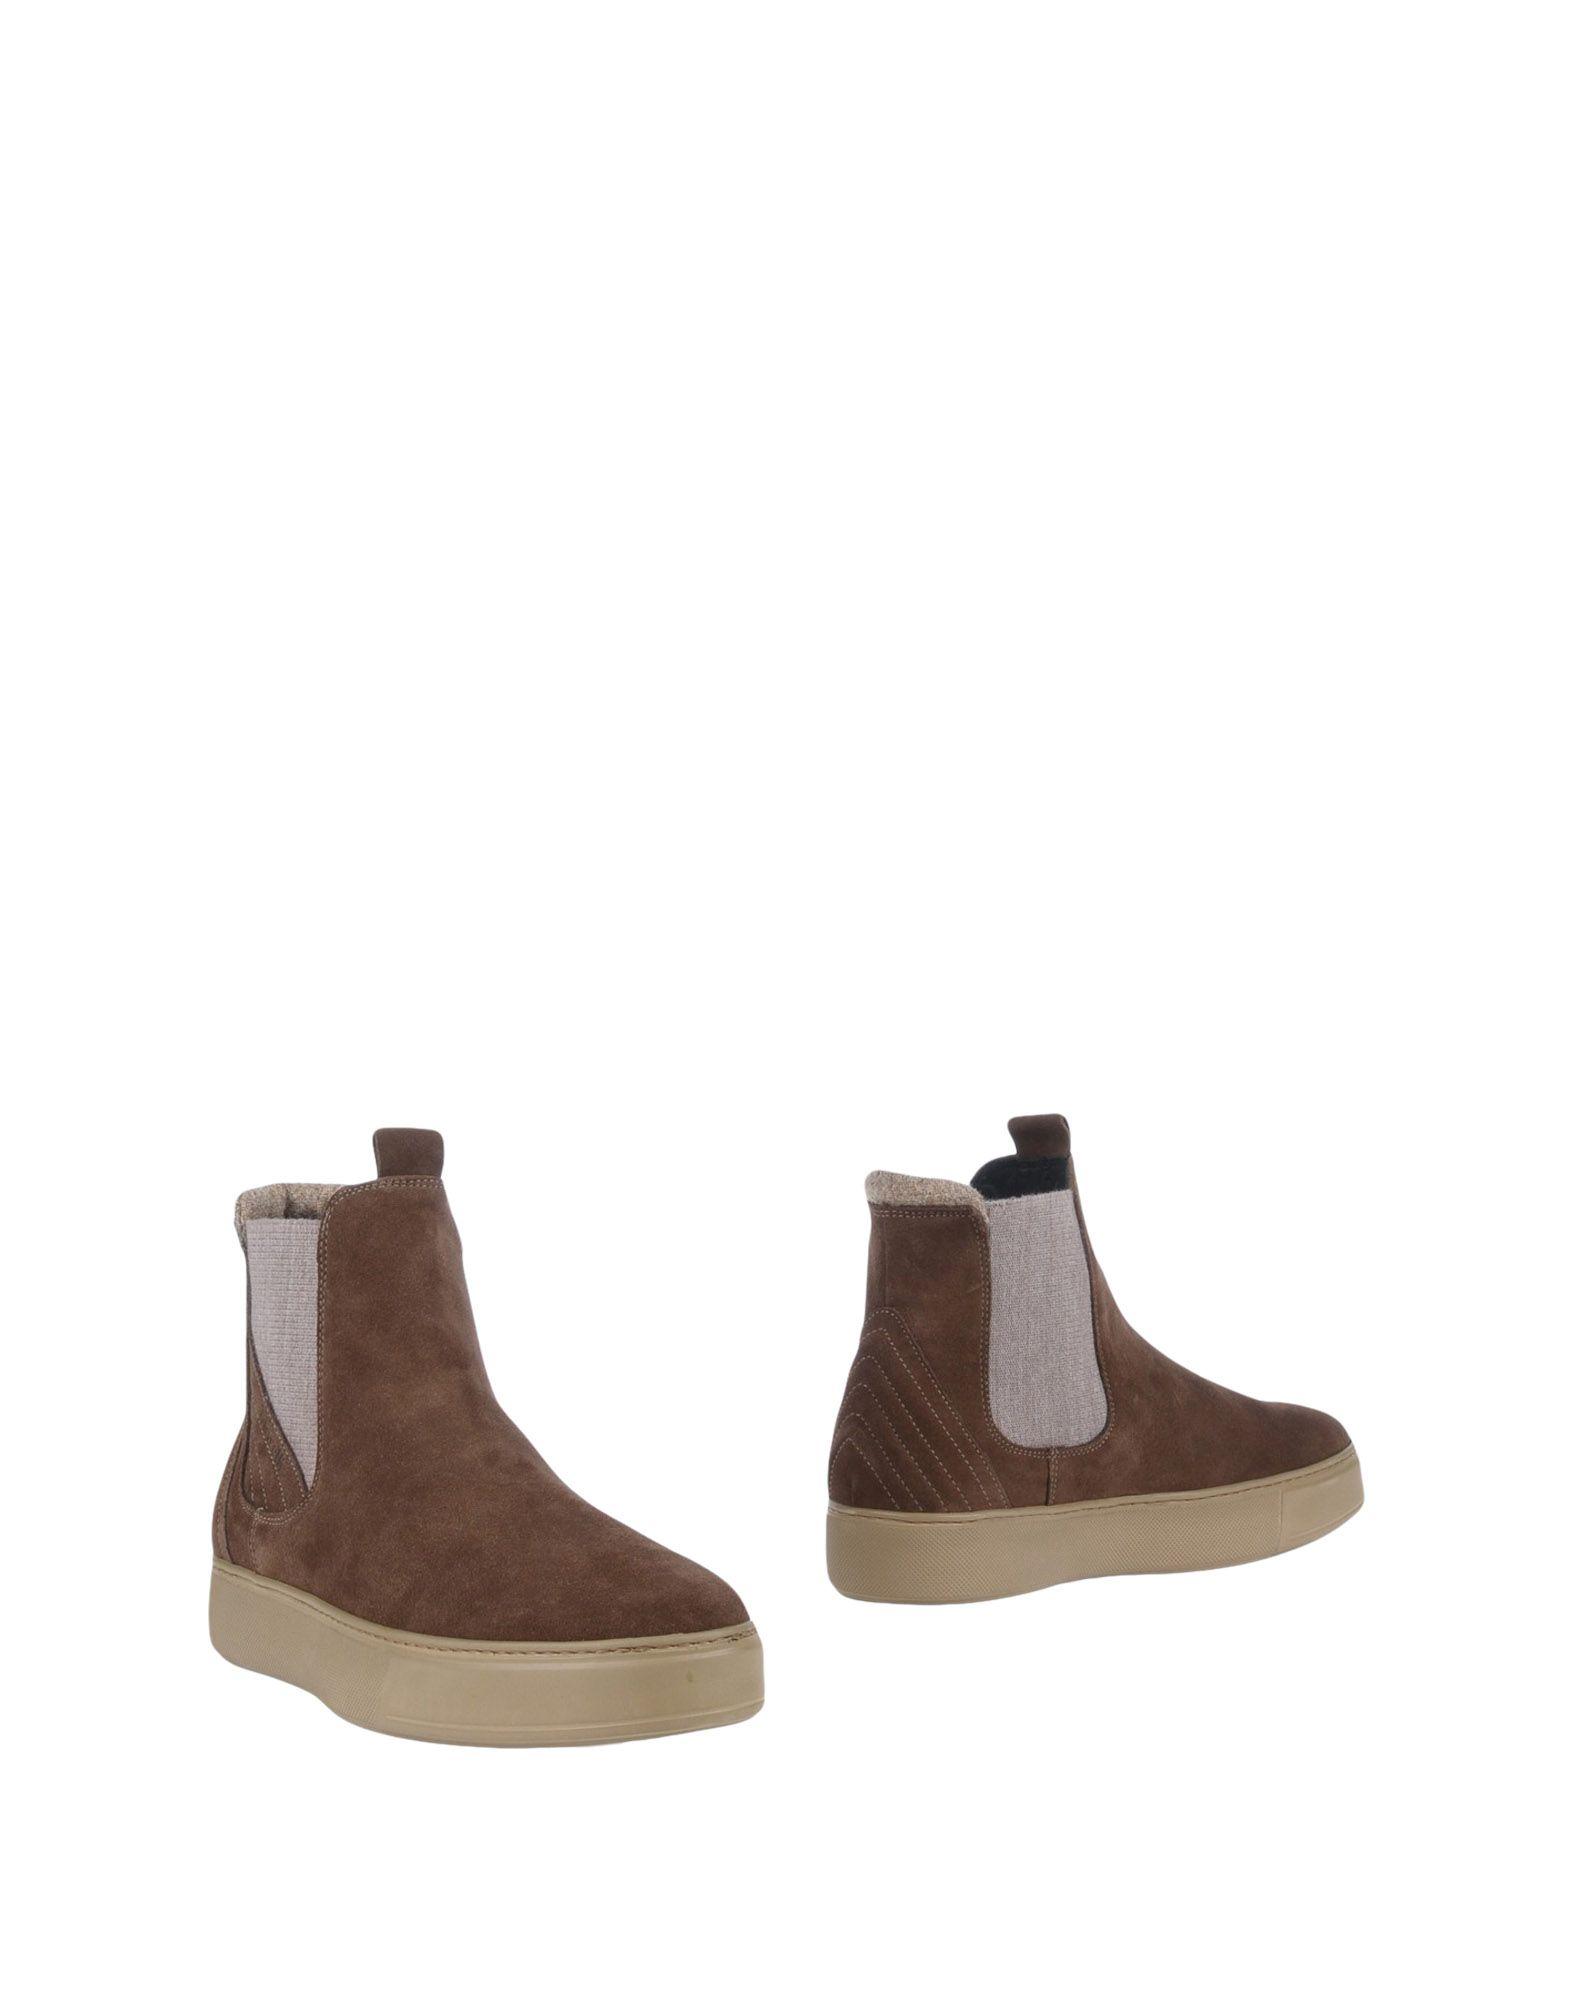 Rabatt echte Schuhe Andrea Morelli Stiefelette Herren  11506946QG